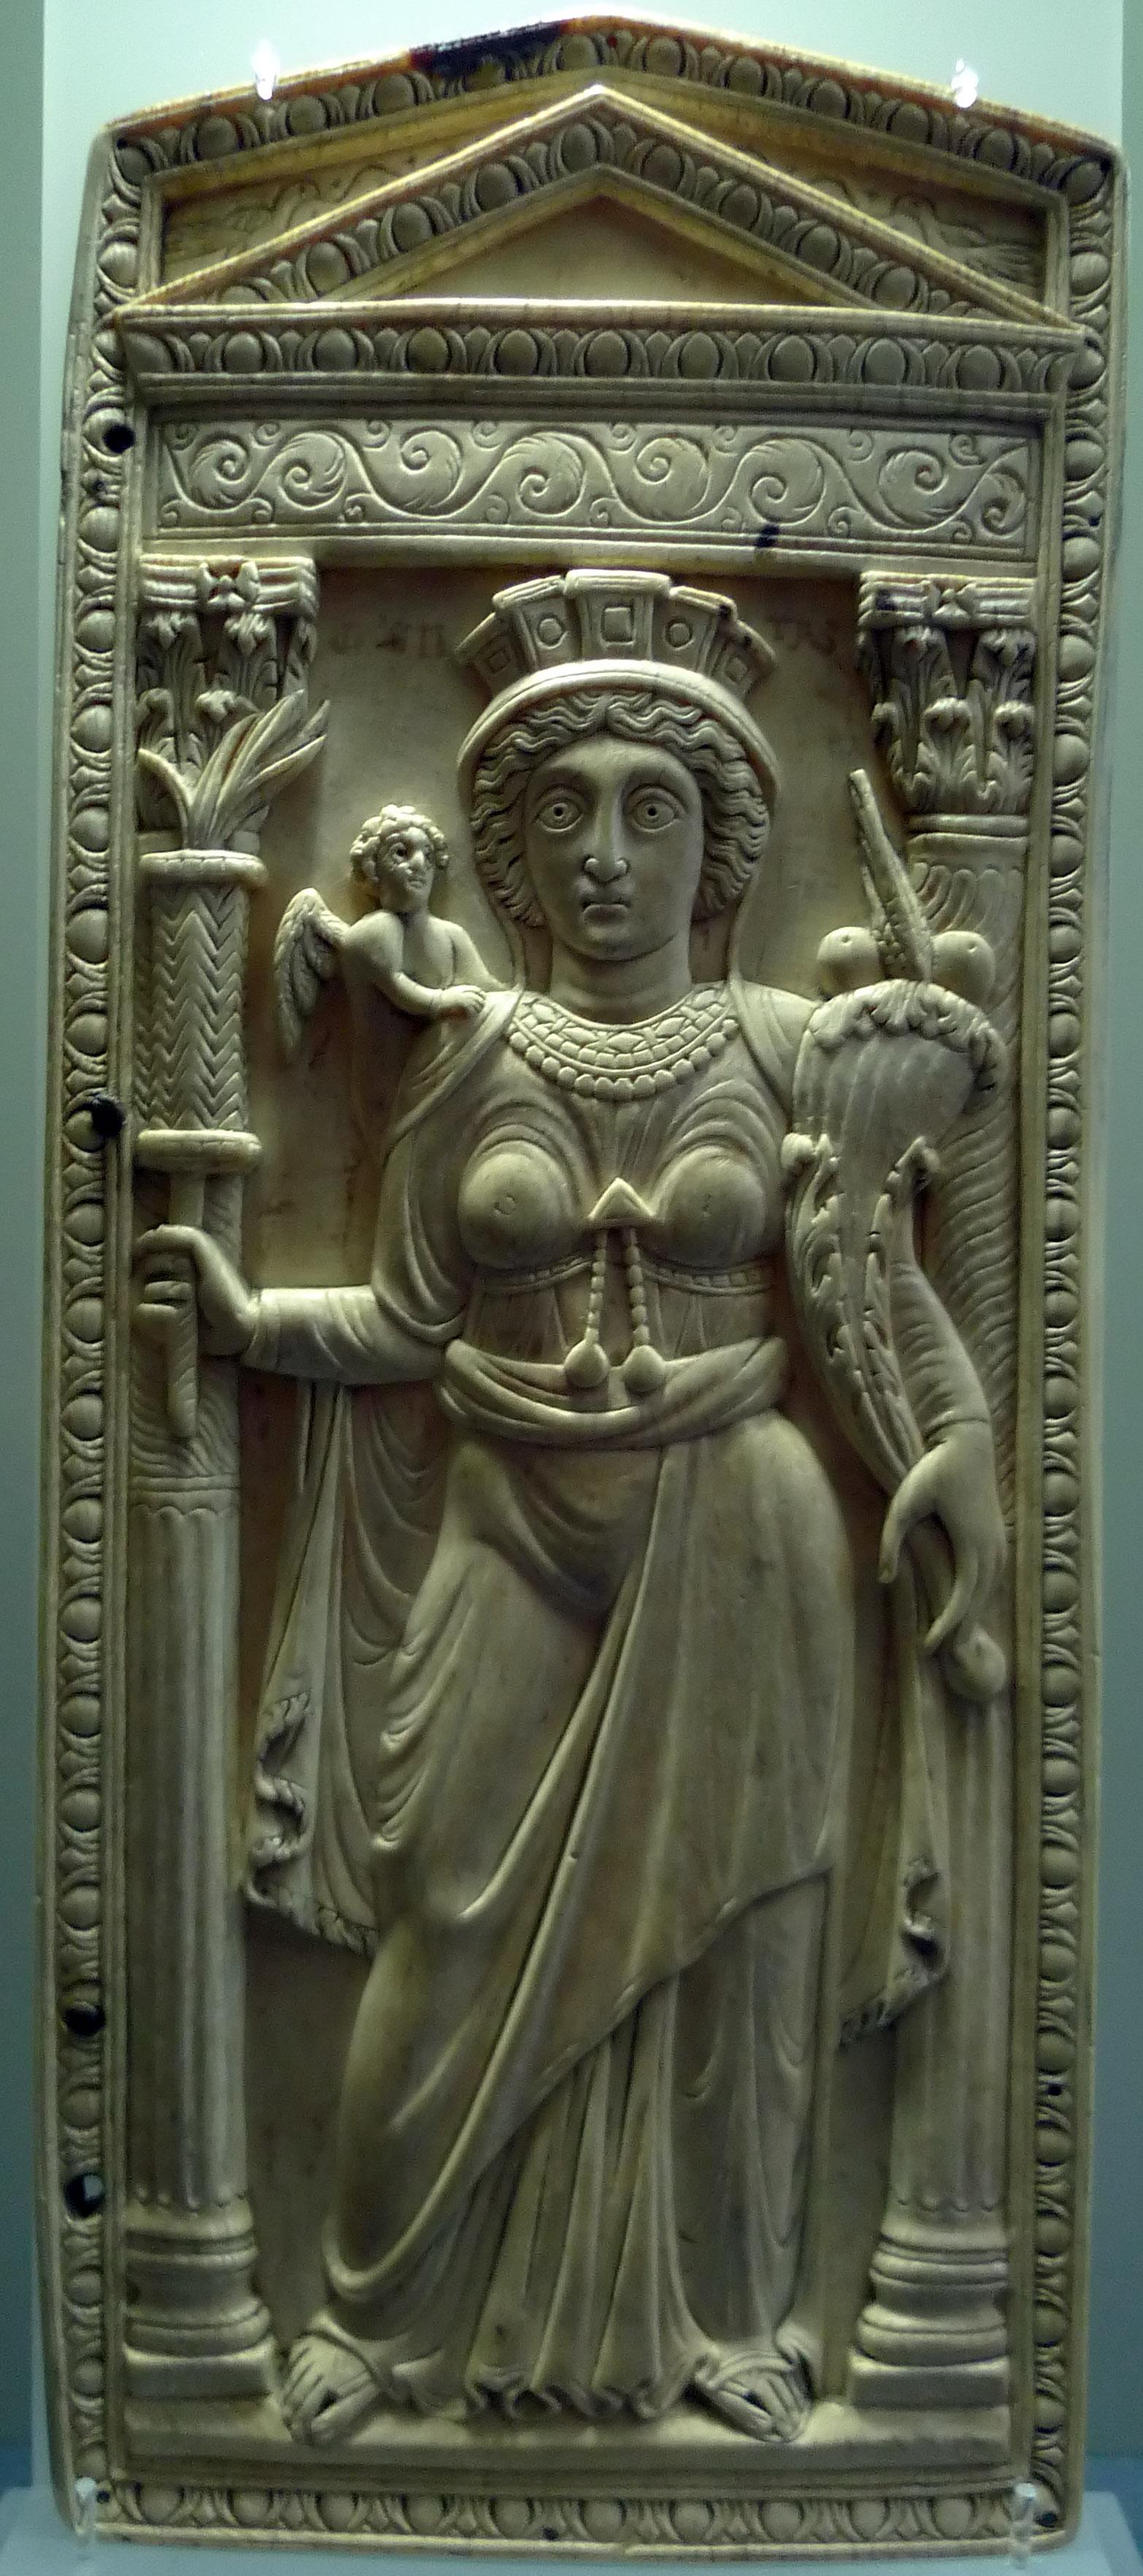 12 Byzantine Rulers